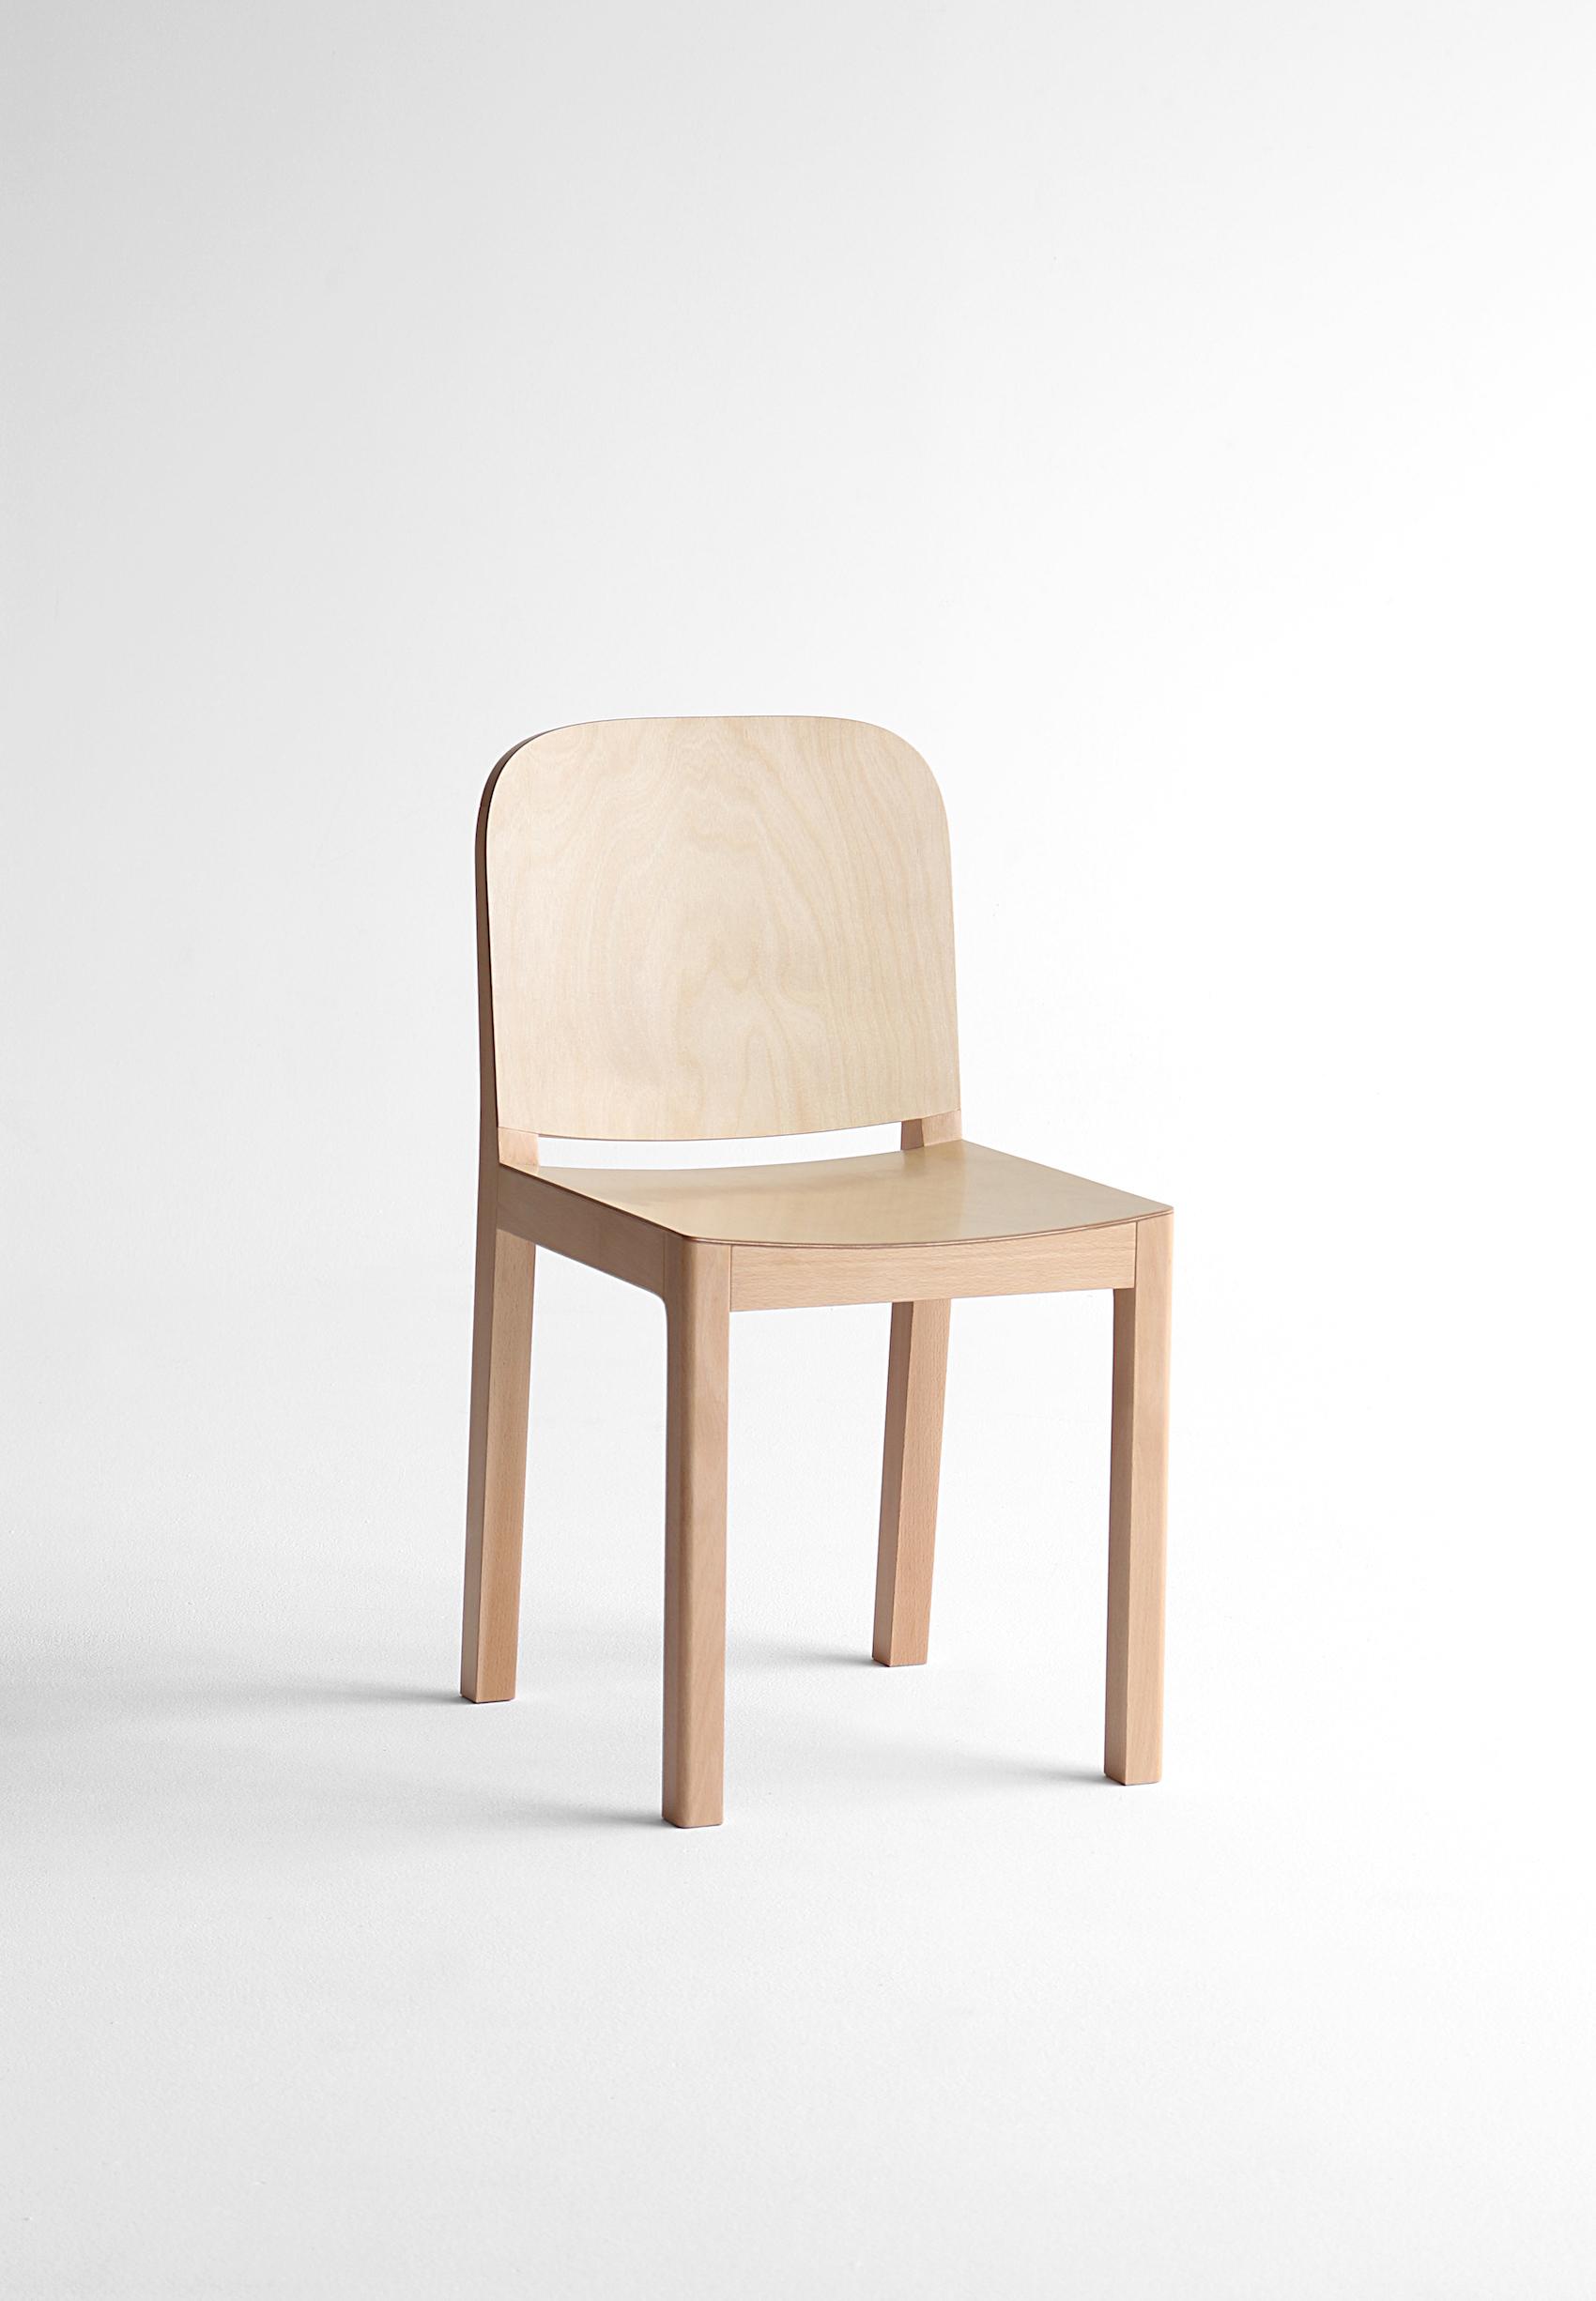 Gyeol Chair by Jungmo Yang